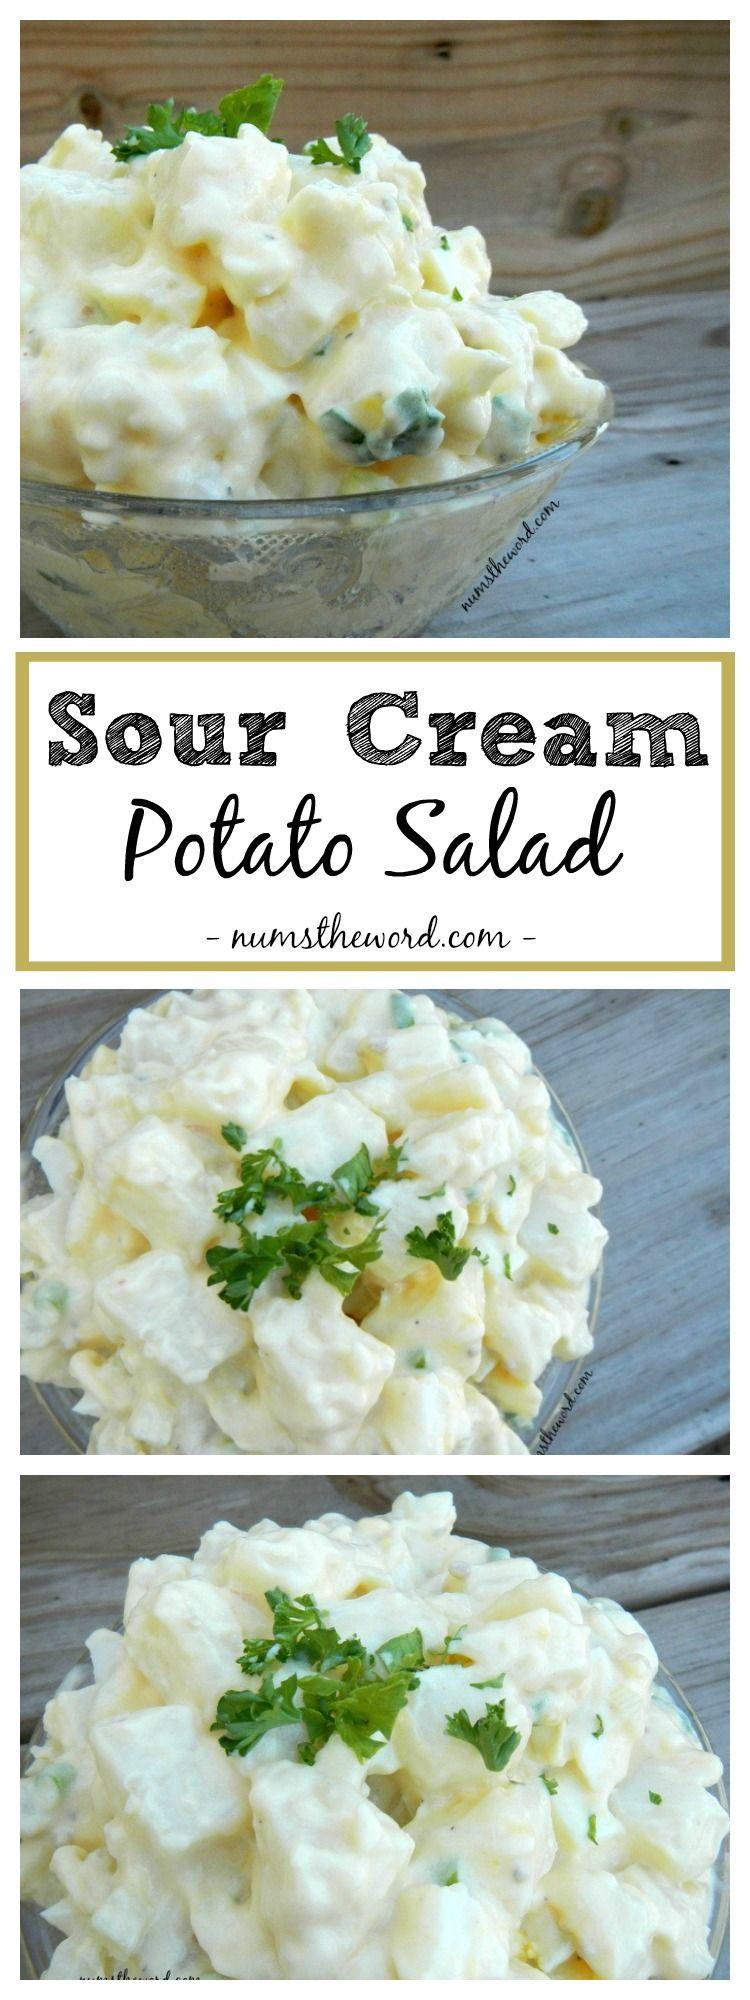 Sour Cream Potato Salad Numstheword Sour Cream Potatoes Sour Cream Potato Salad Creamed Potatoes